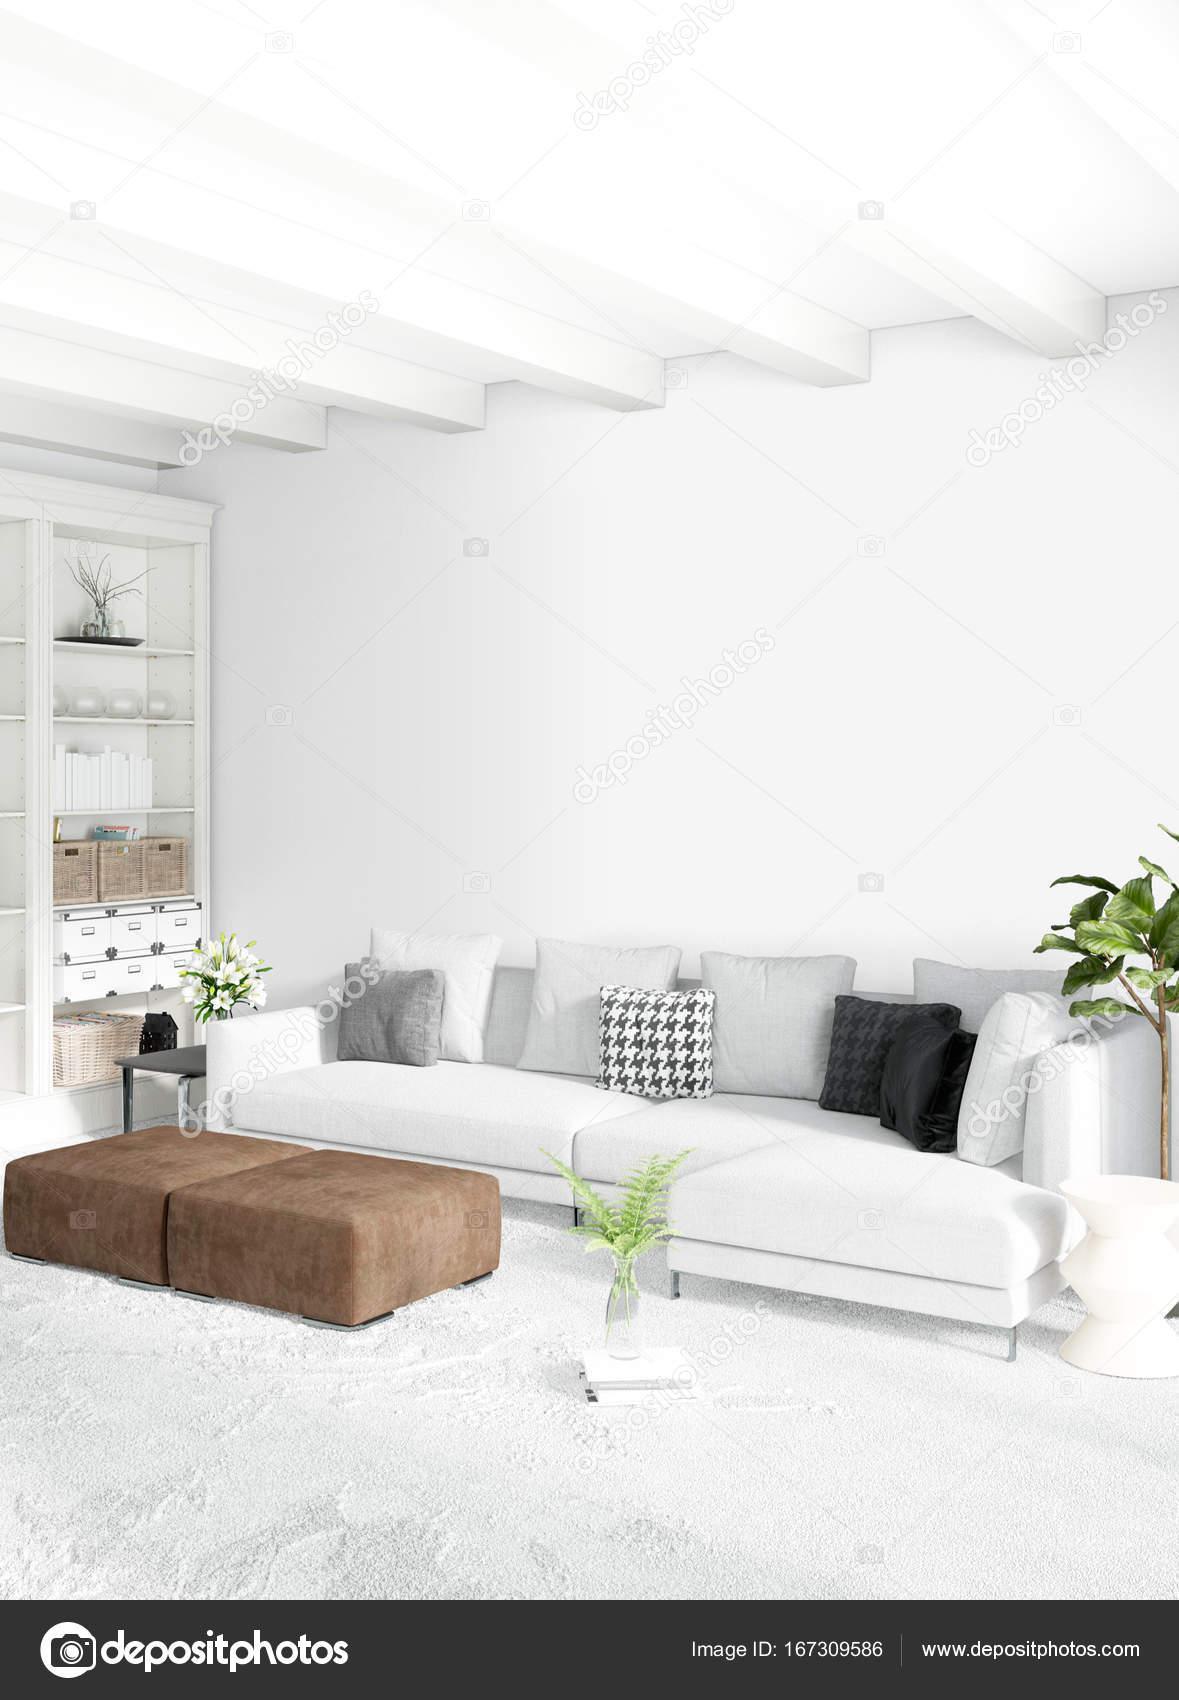 https://st3.depositphotos.com/5167347/16730/i/1600/depositphotos_167309586-stockafbeelding-wit-slaapkamer-minimalistische-stijl-interieur.jpg